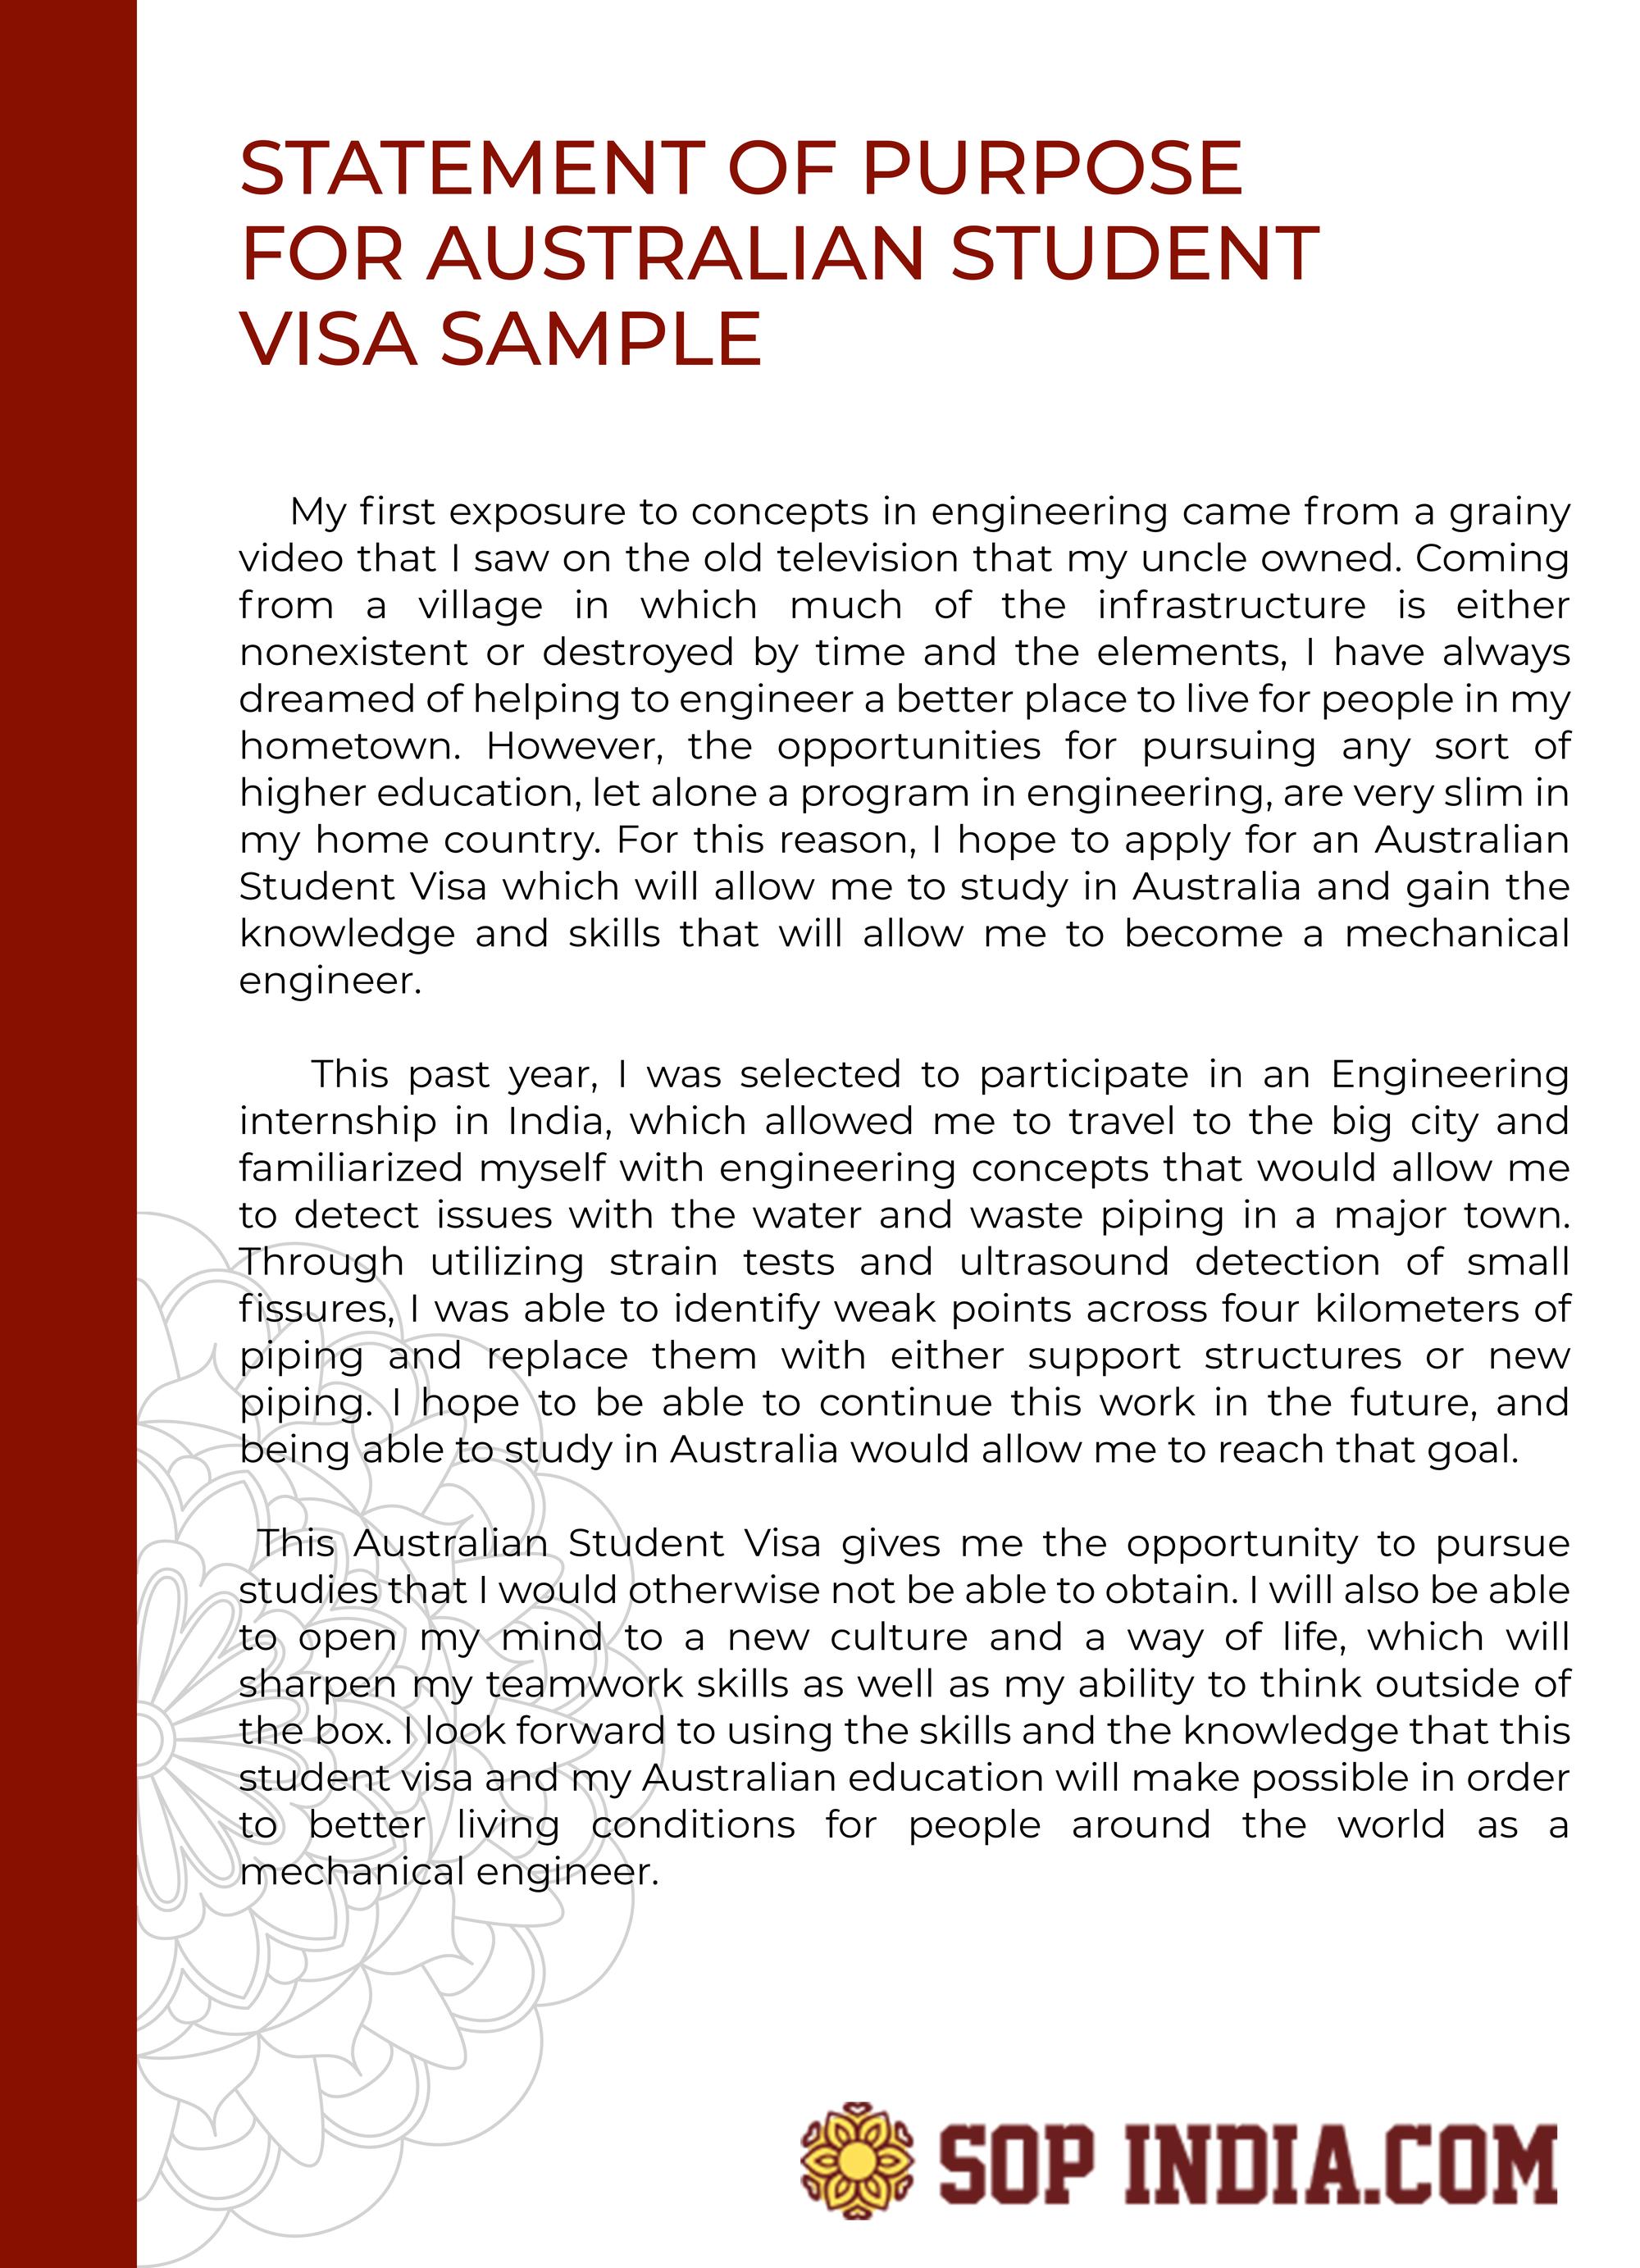 Statement Of Purpose For Australian Student Visa Sample In 2020